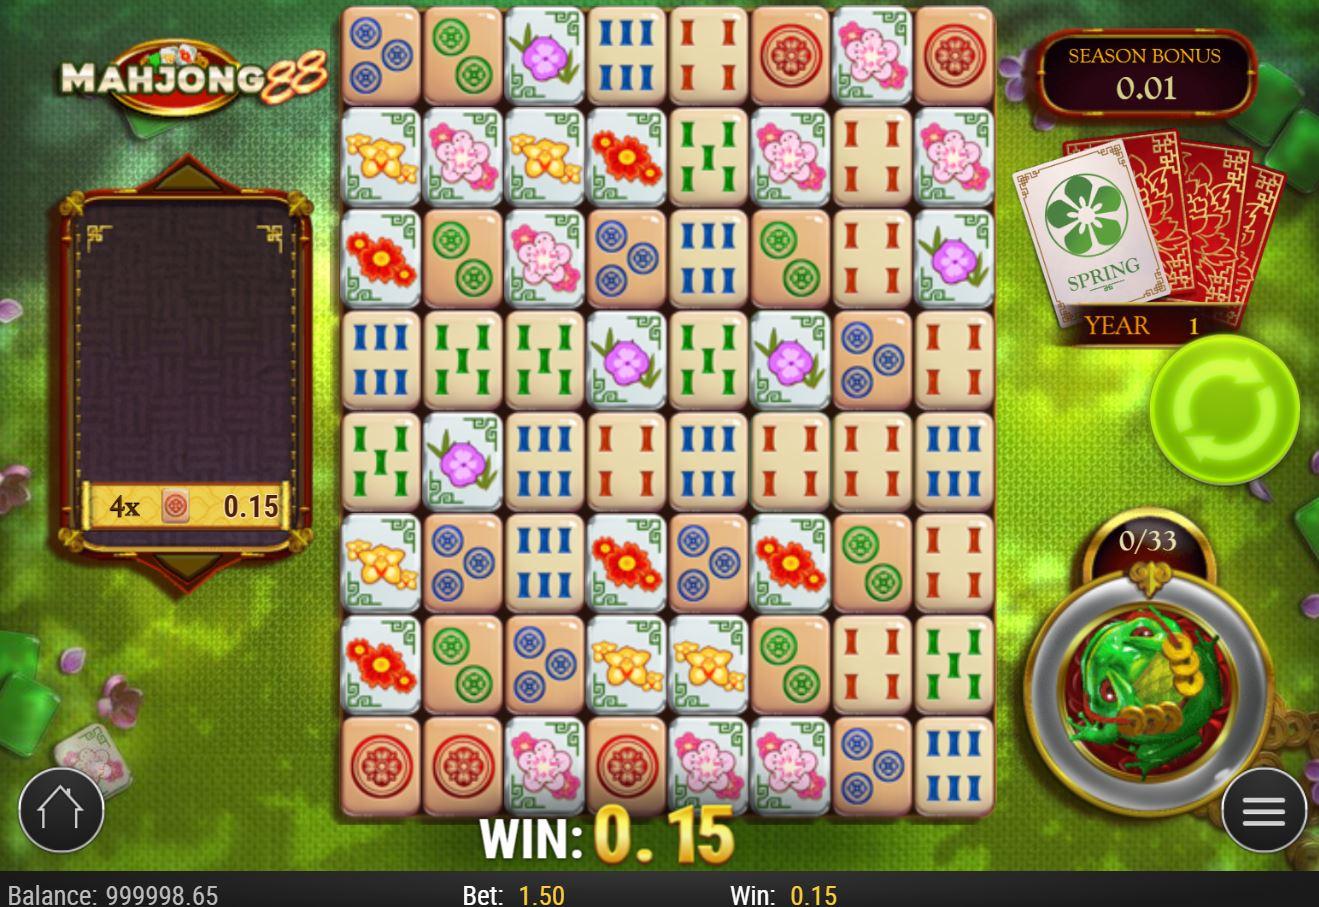 Mahjong 88 Slot Gameplay